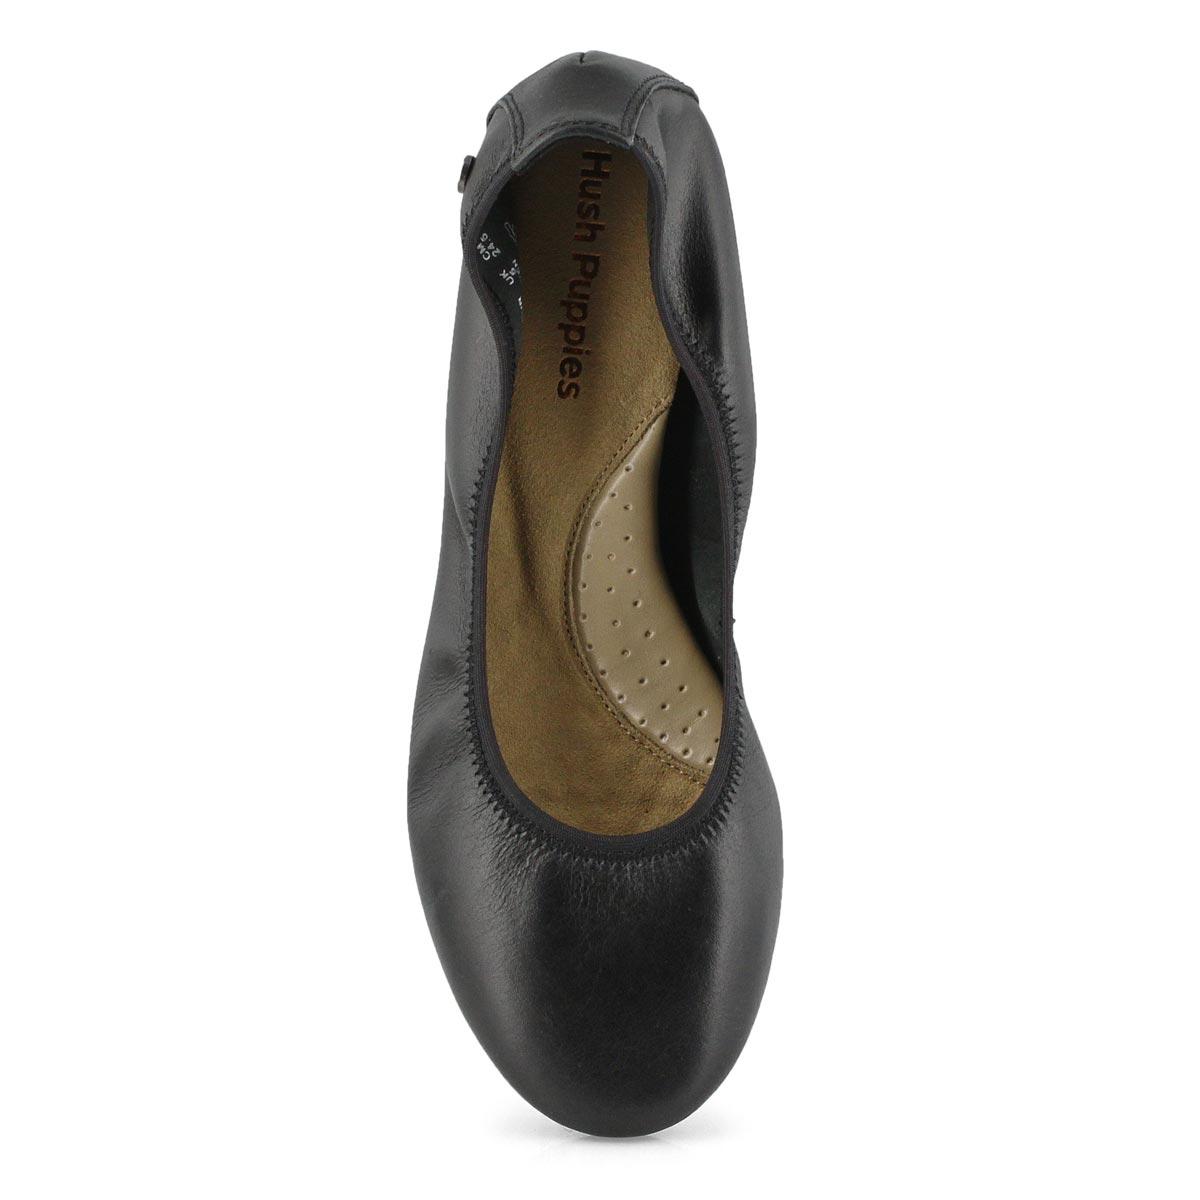 Lds Chaste Ballet black leather flat